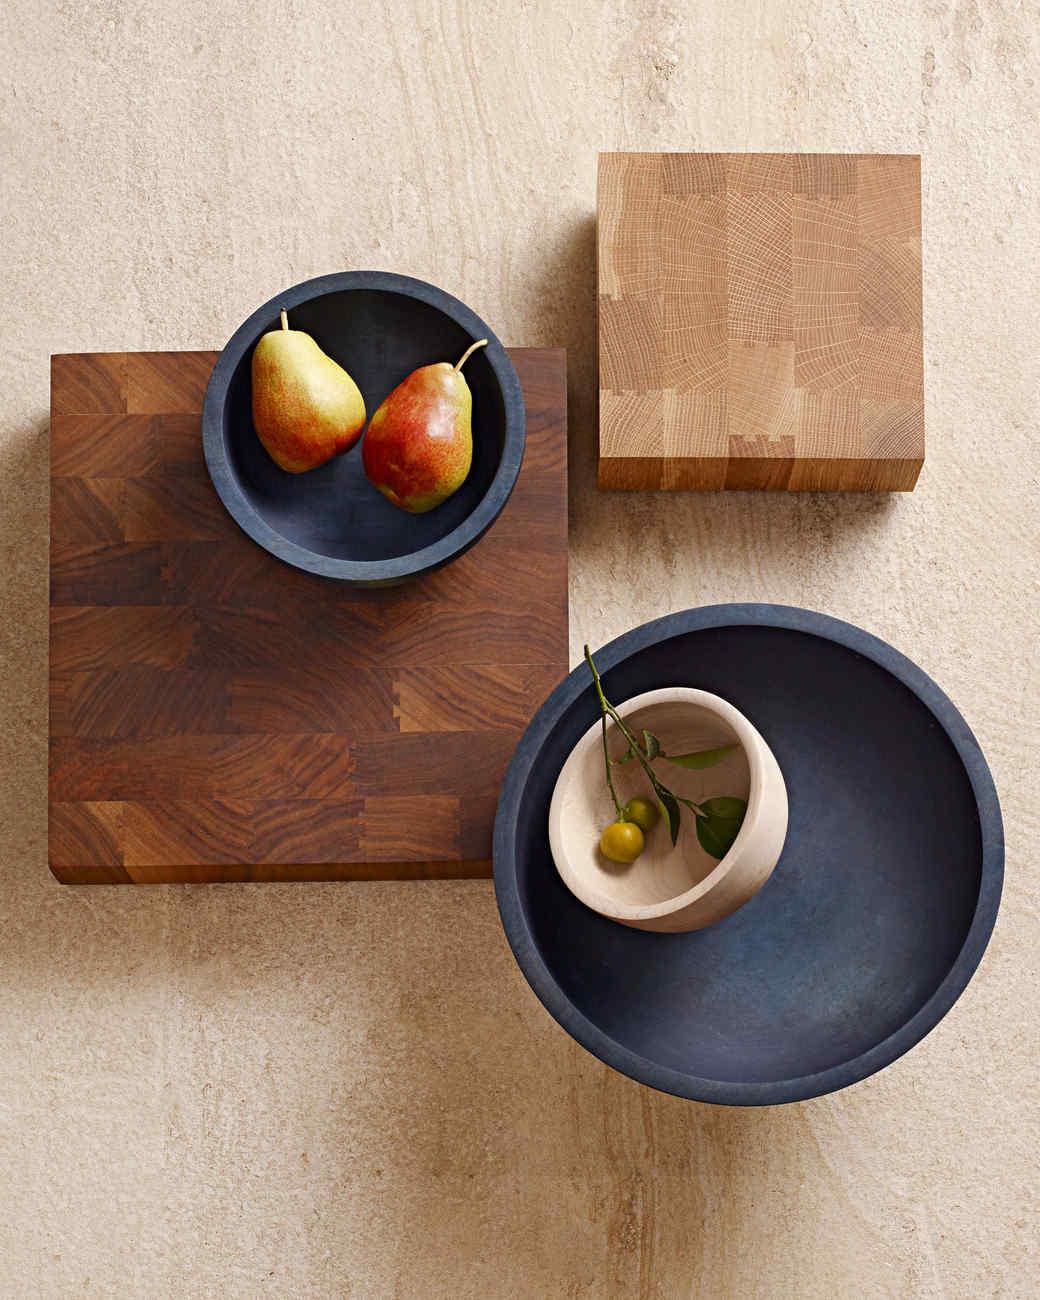 Silvia Song's wooden bowls and butcher blocks